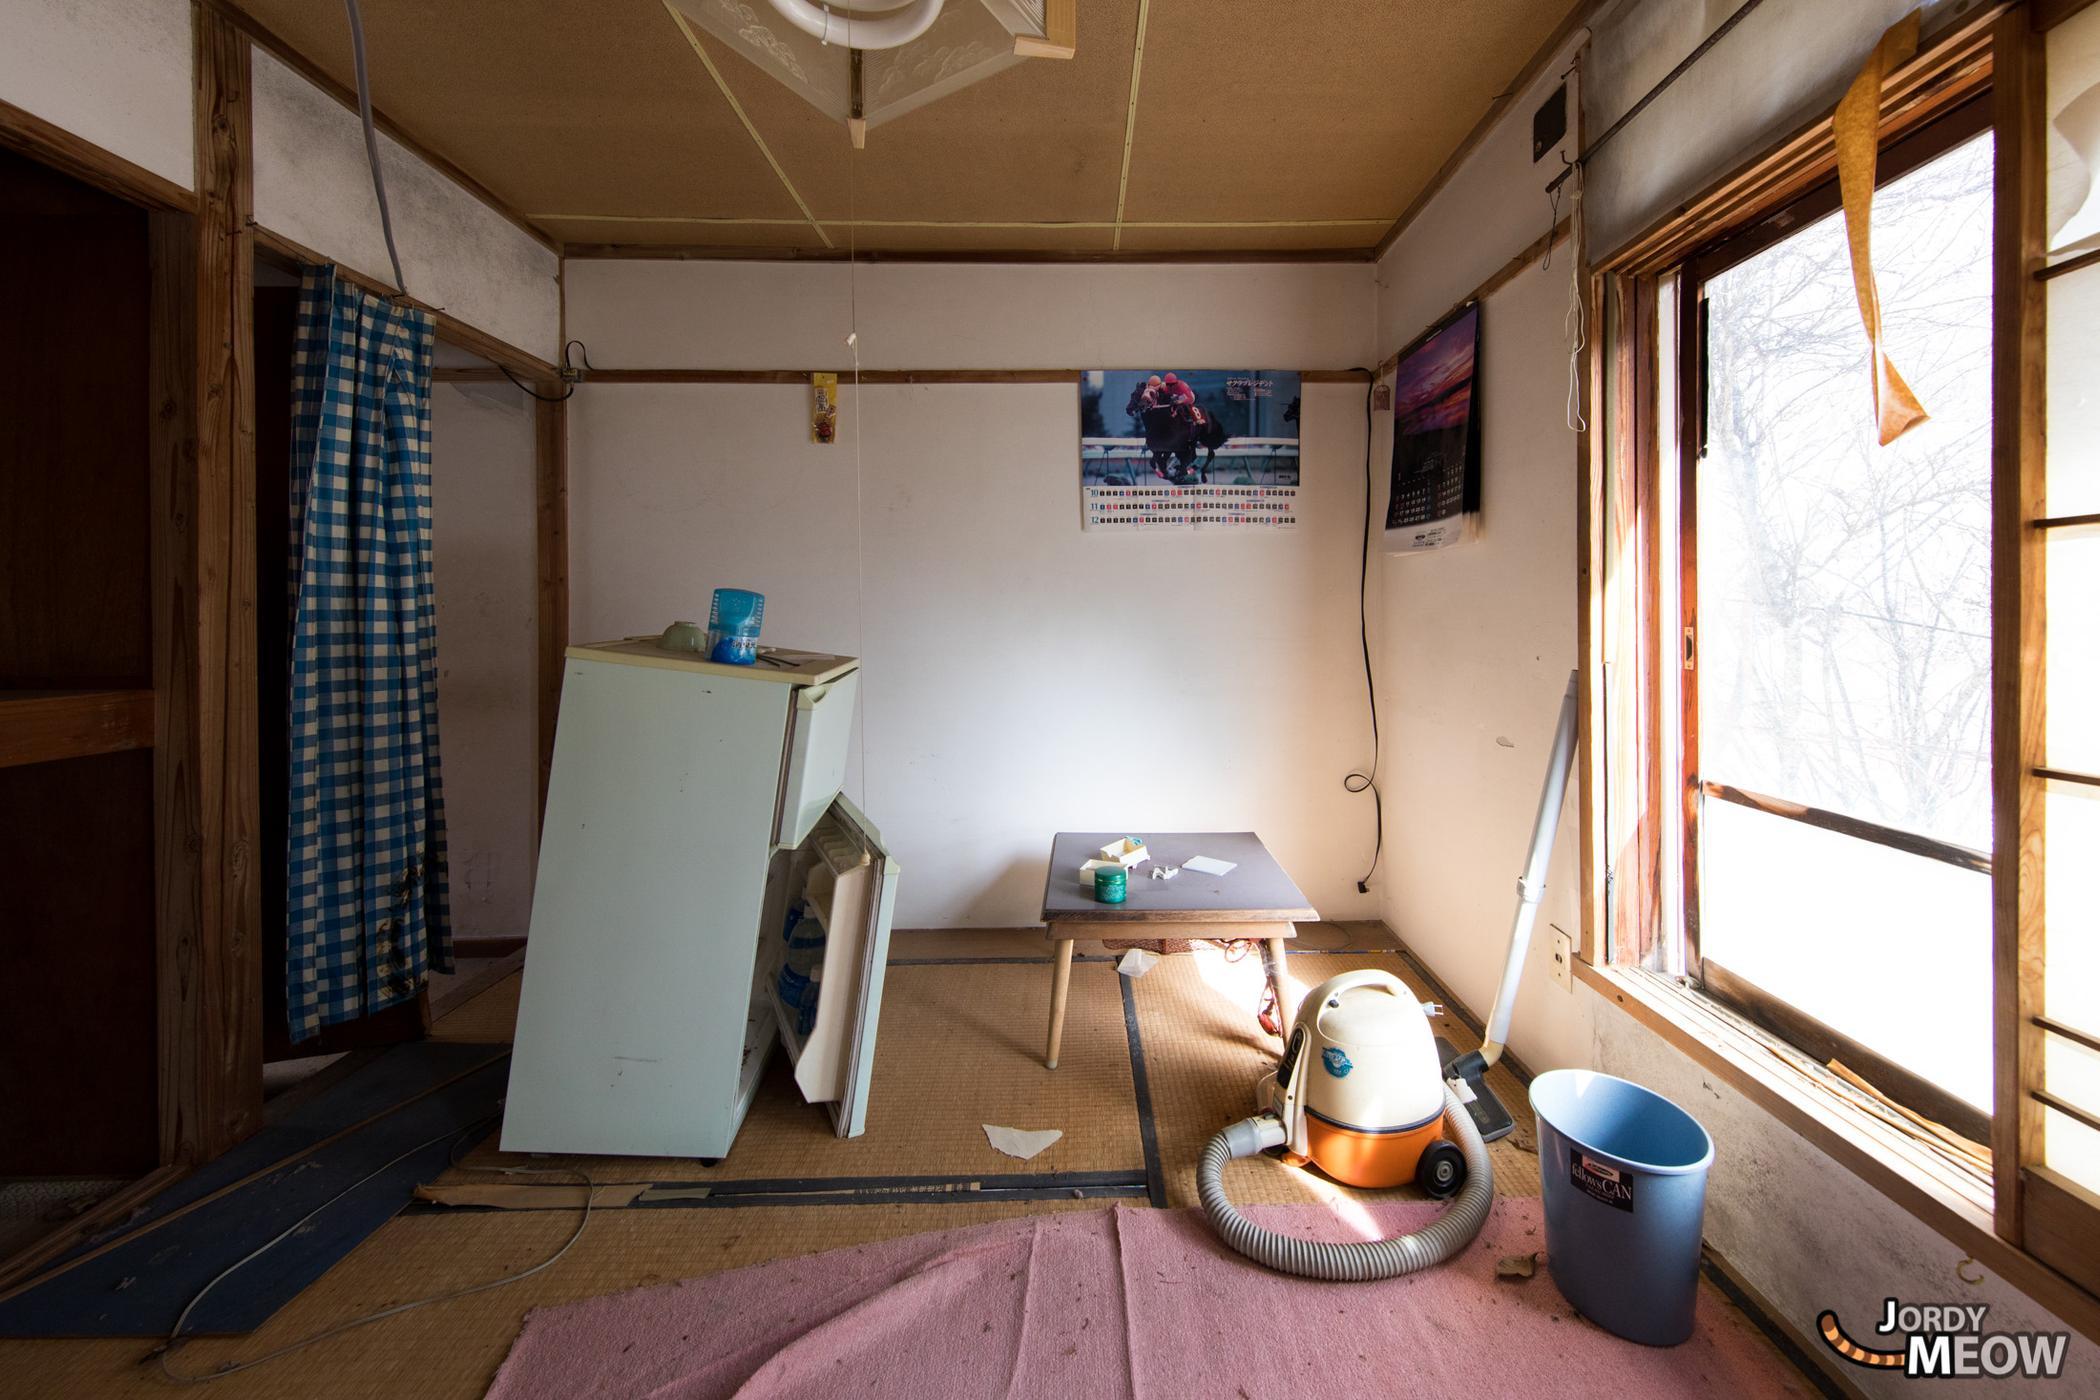 abandoned, chichibu, haikyo, japan, japanese, kanto, ruin, saitama, urban exploration, urbex, village